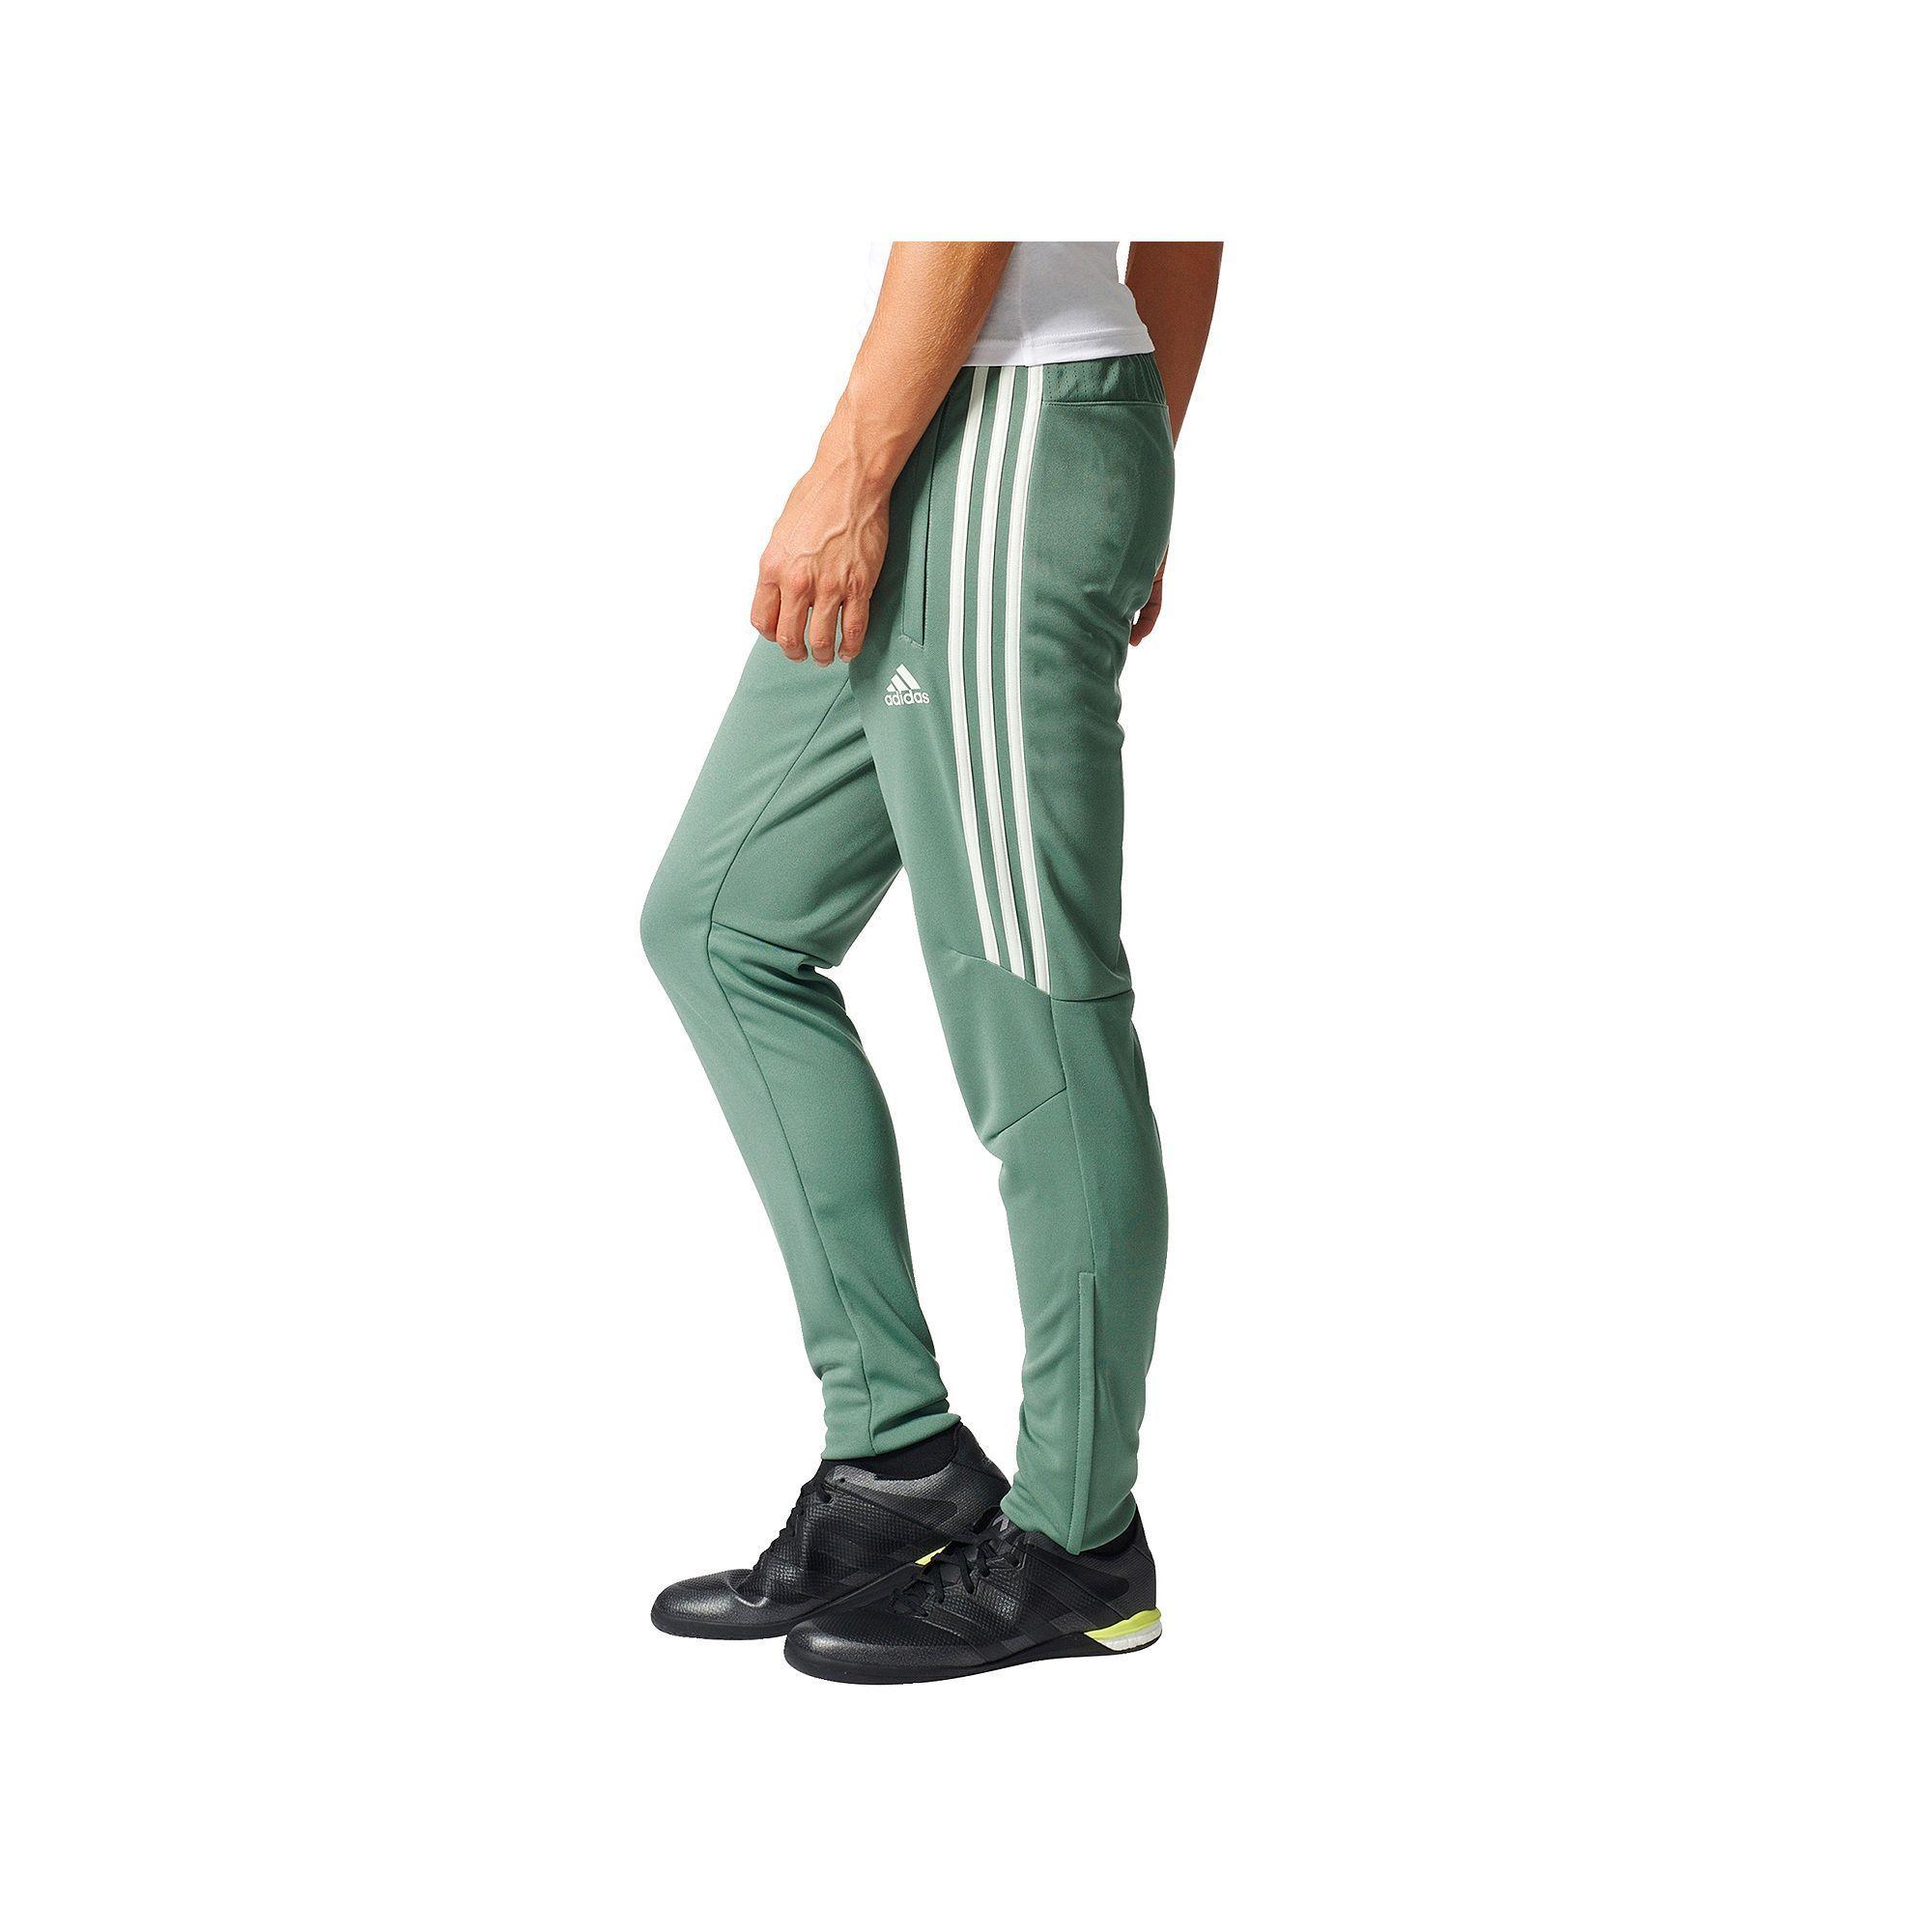 Adidas Originals Camo Windbreaker TrackSuit Boutique